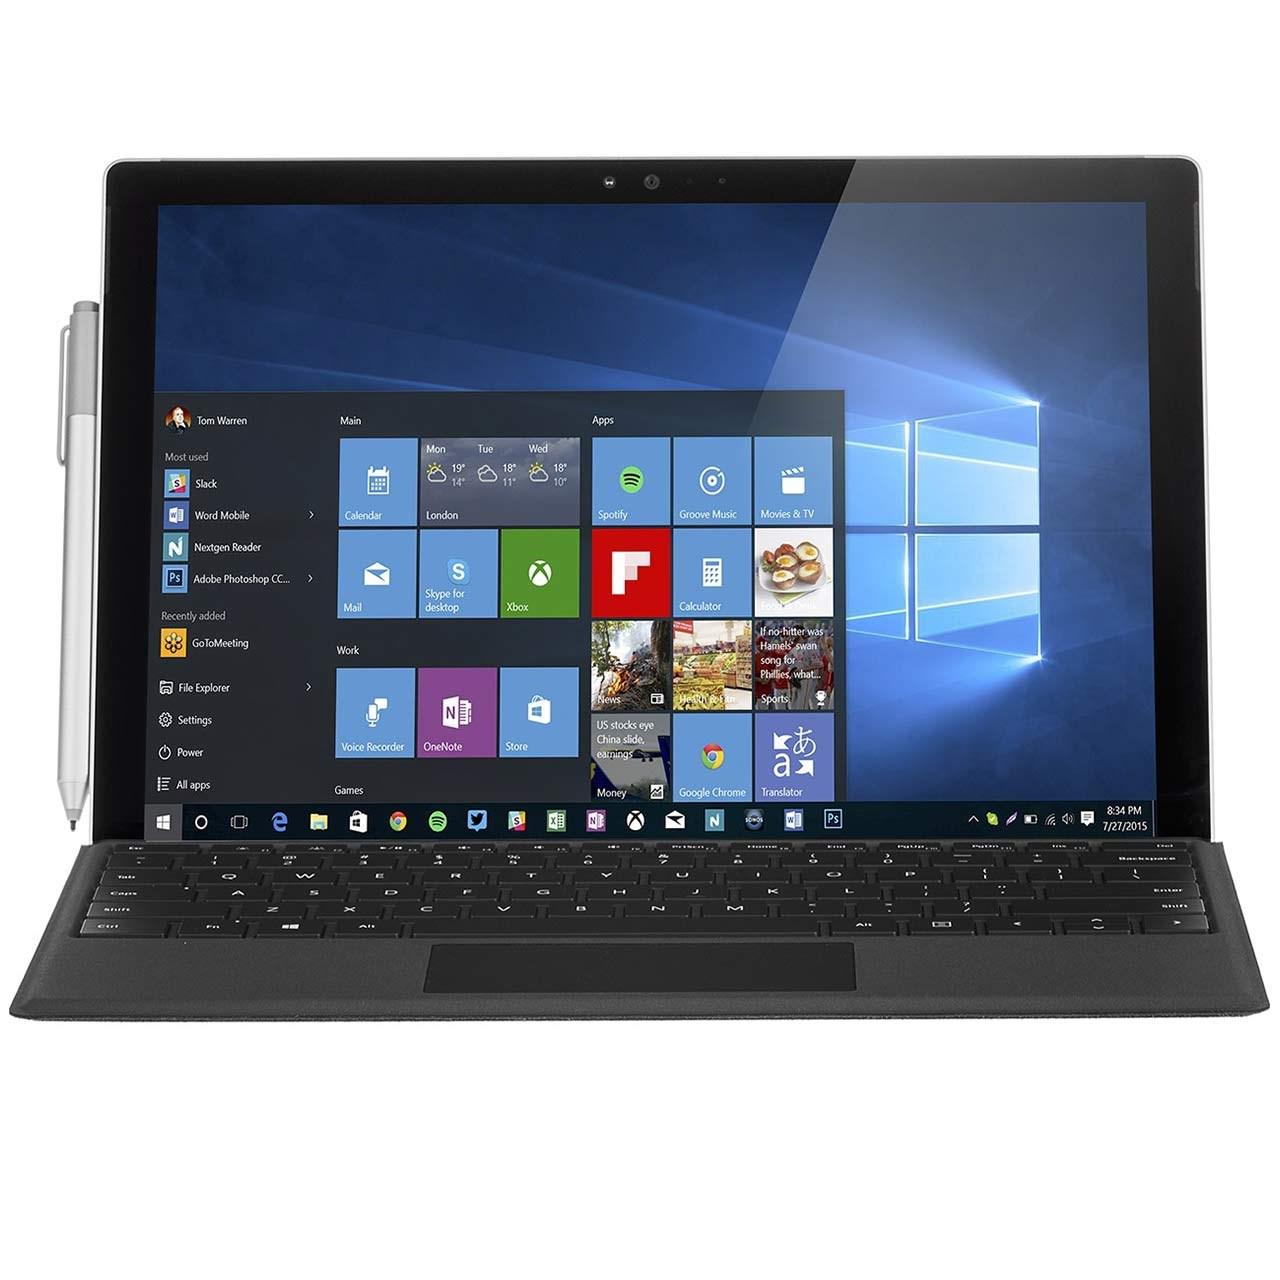 تبلت مایکروسافت مدل Surface Pro 4 - A به همراه کیبورد Type Cover و کاور Executive Sleeve